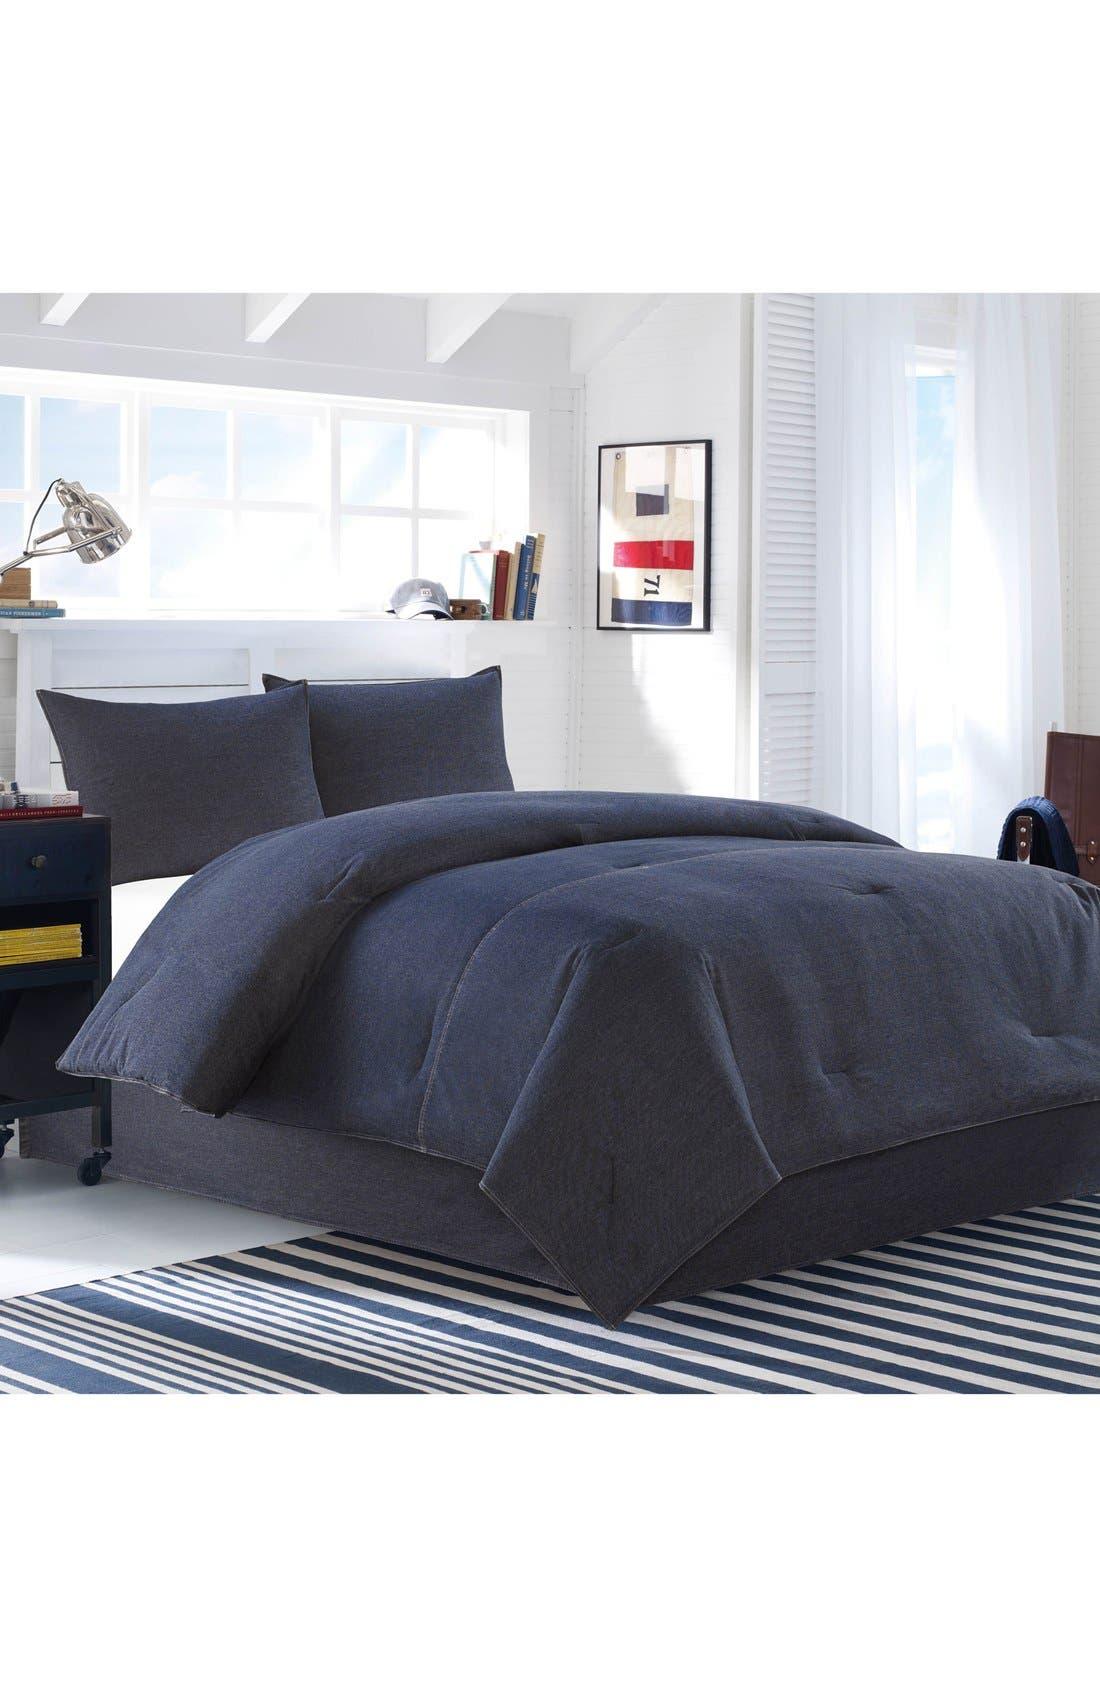 NAUTICA, Seaward Comforter & Sham Set, Main thumbnail 1, color, DENIM BLUE